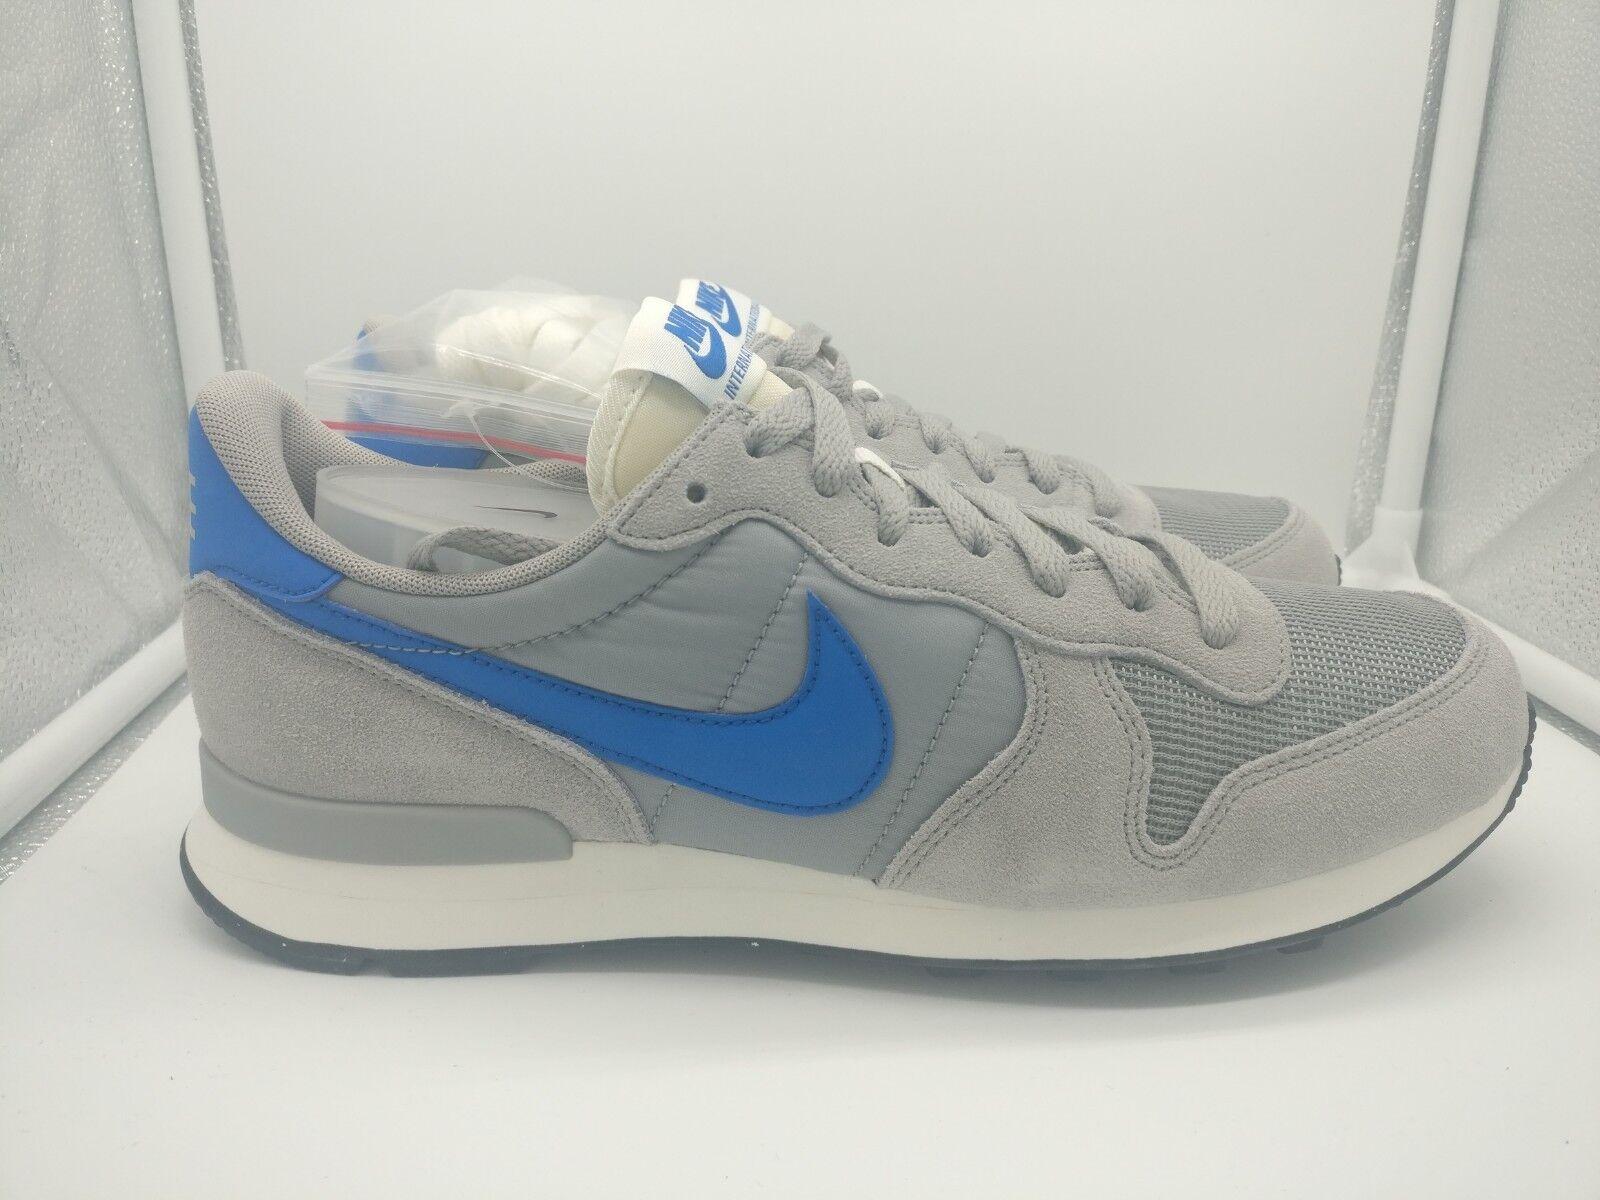 Nike internazionalista opaca argentoo blu scintilla vela 828041 004   Nuovo Prodotto 2019    Scolaro/Signora Scarpa